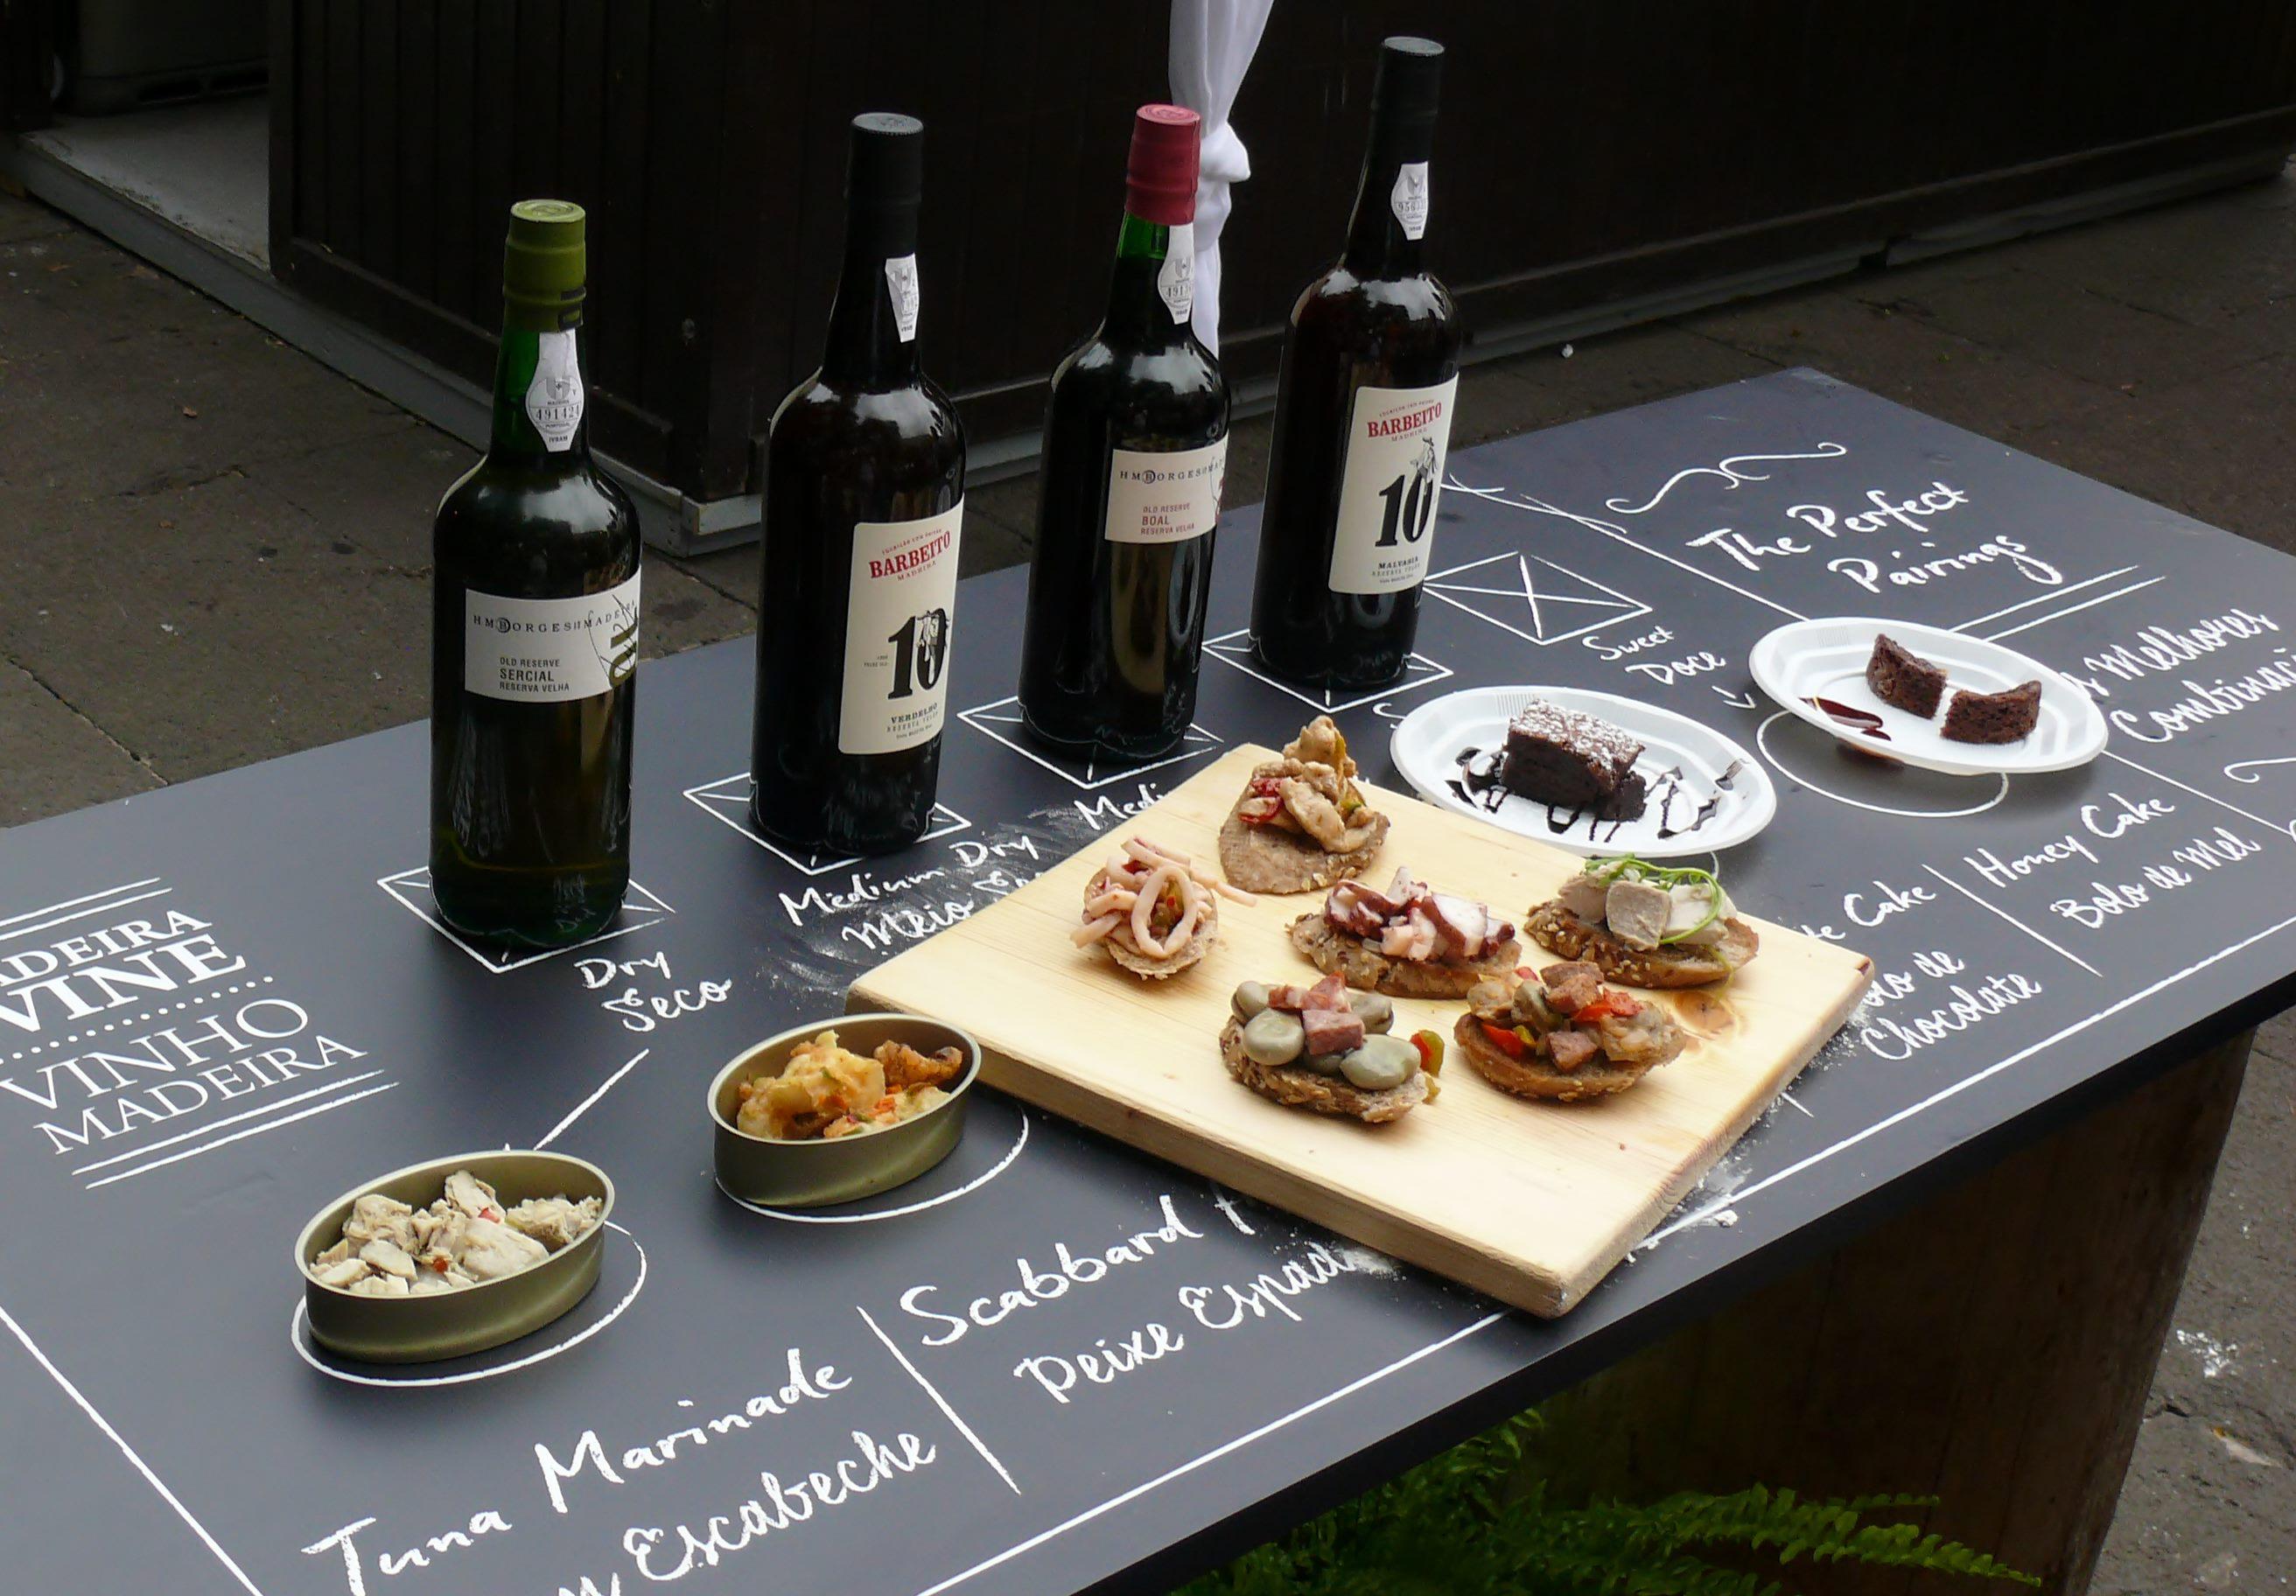 Madeira wine and food pairing